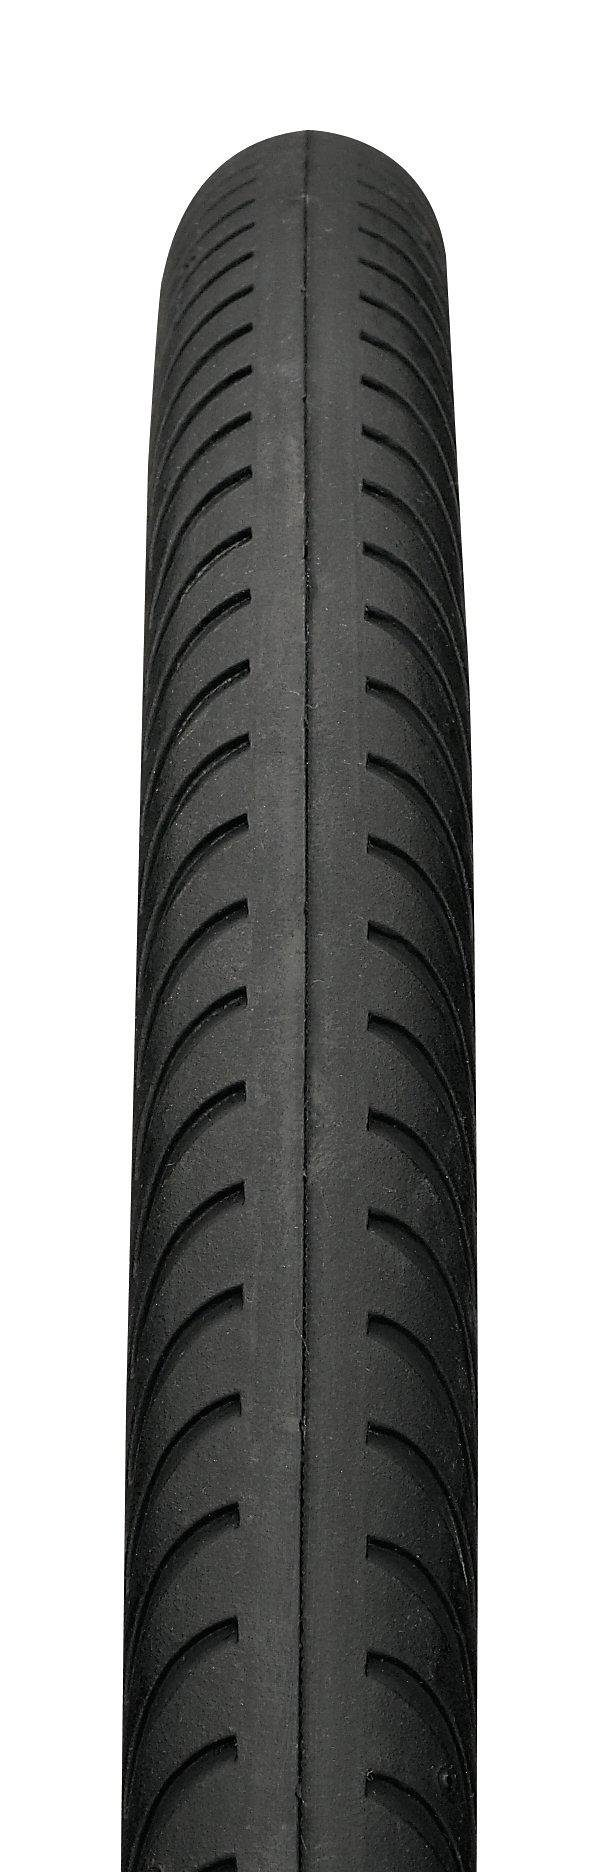 Ritchey Fahrradreifen »WCS Tom Slick Reifen 27,5 Zoll faltbar Dual«